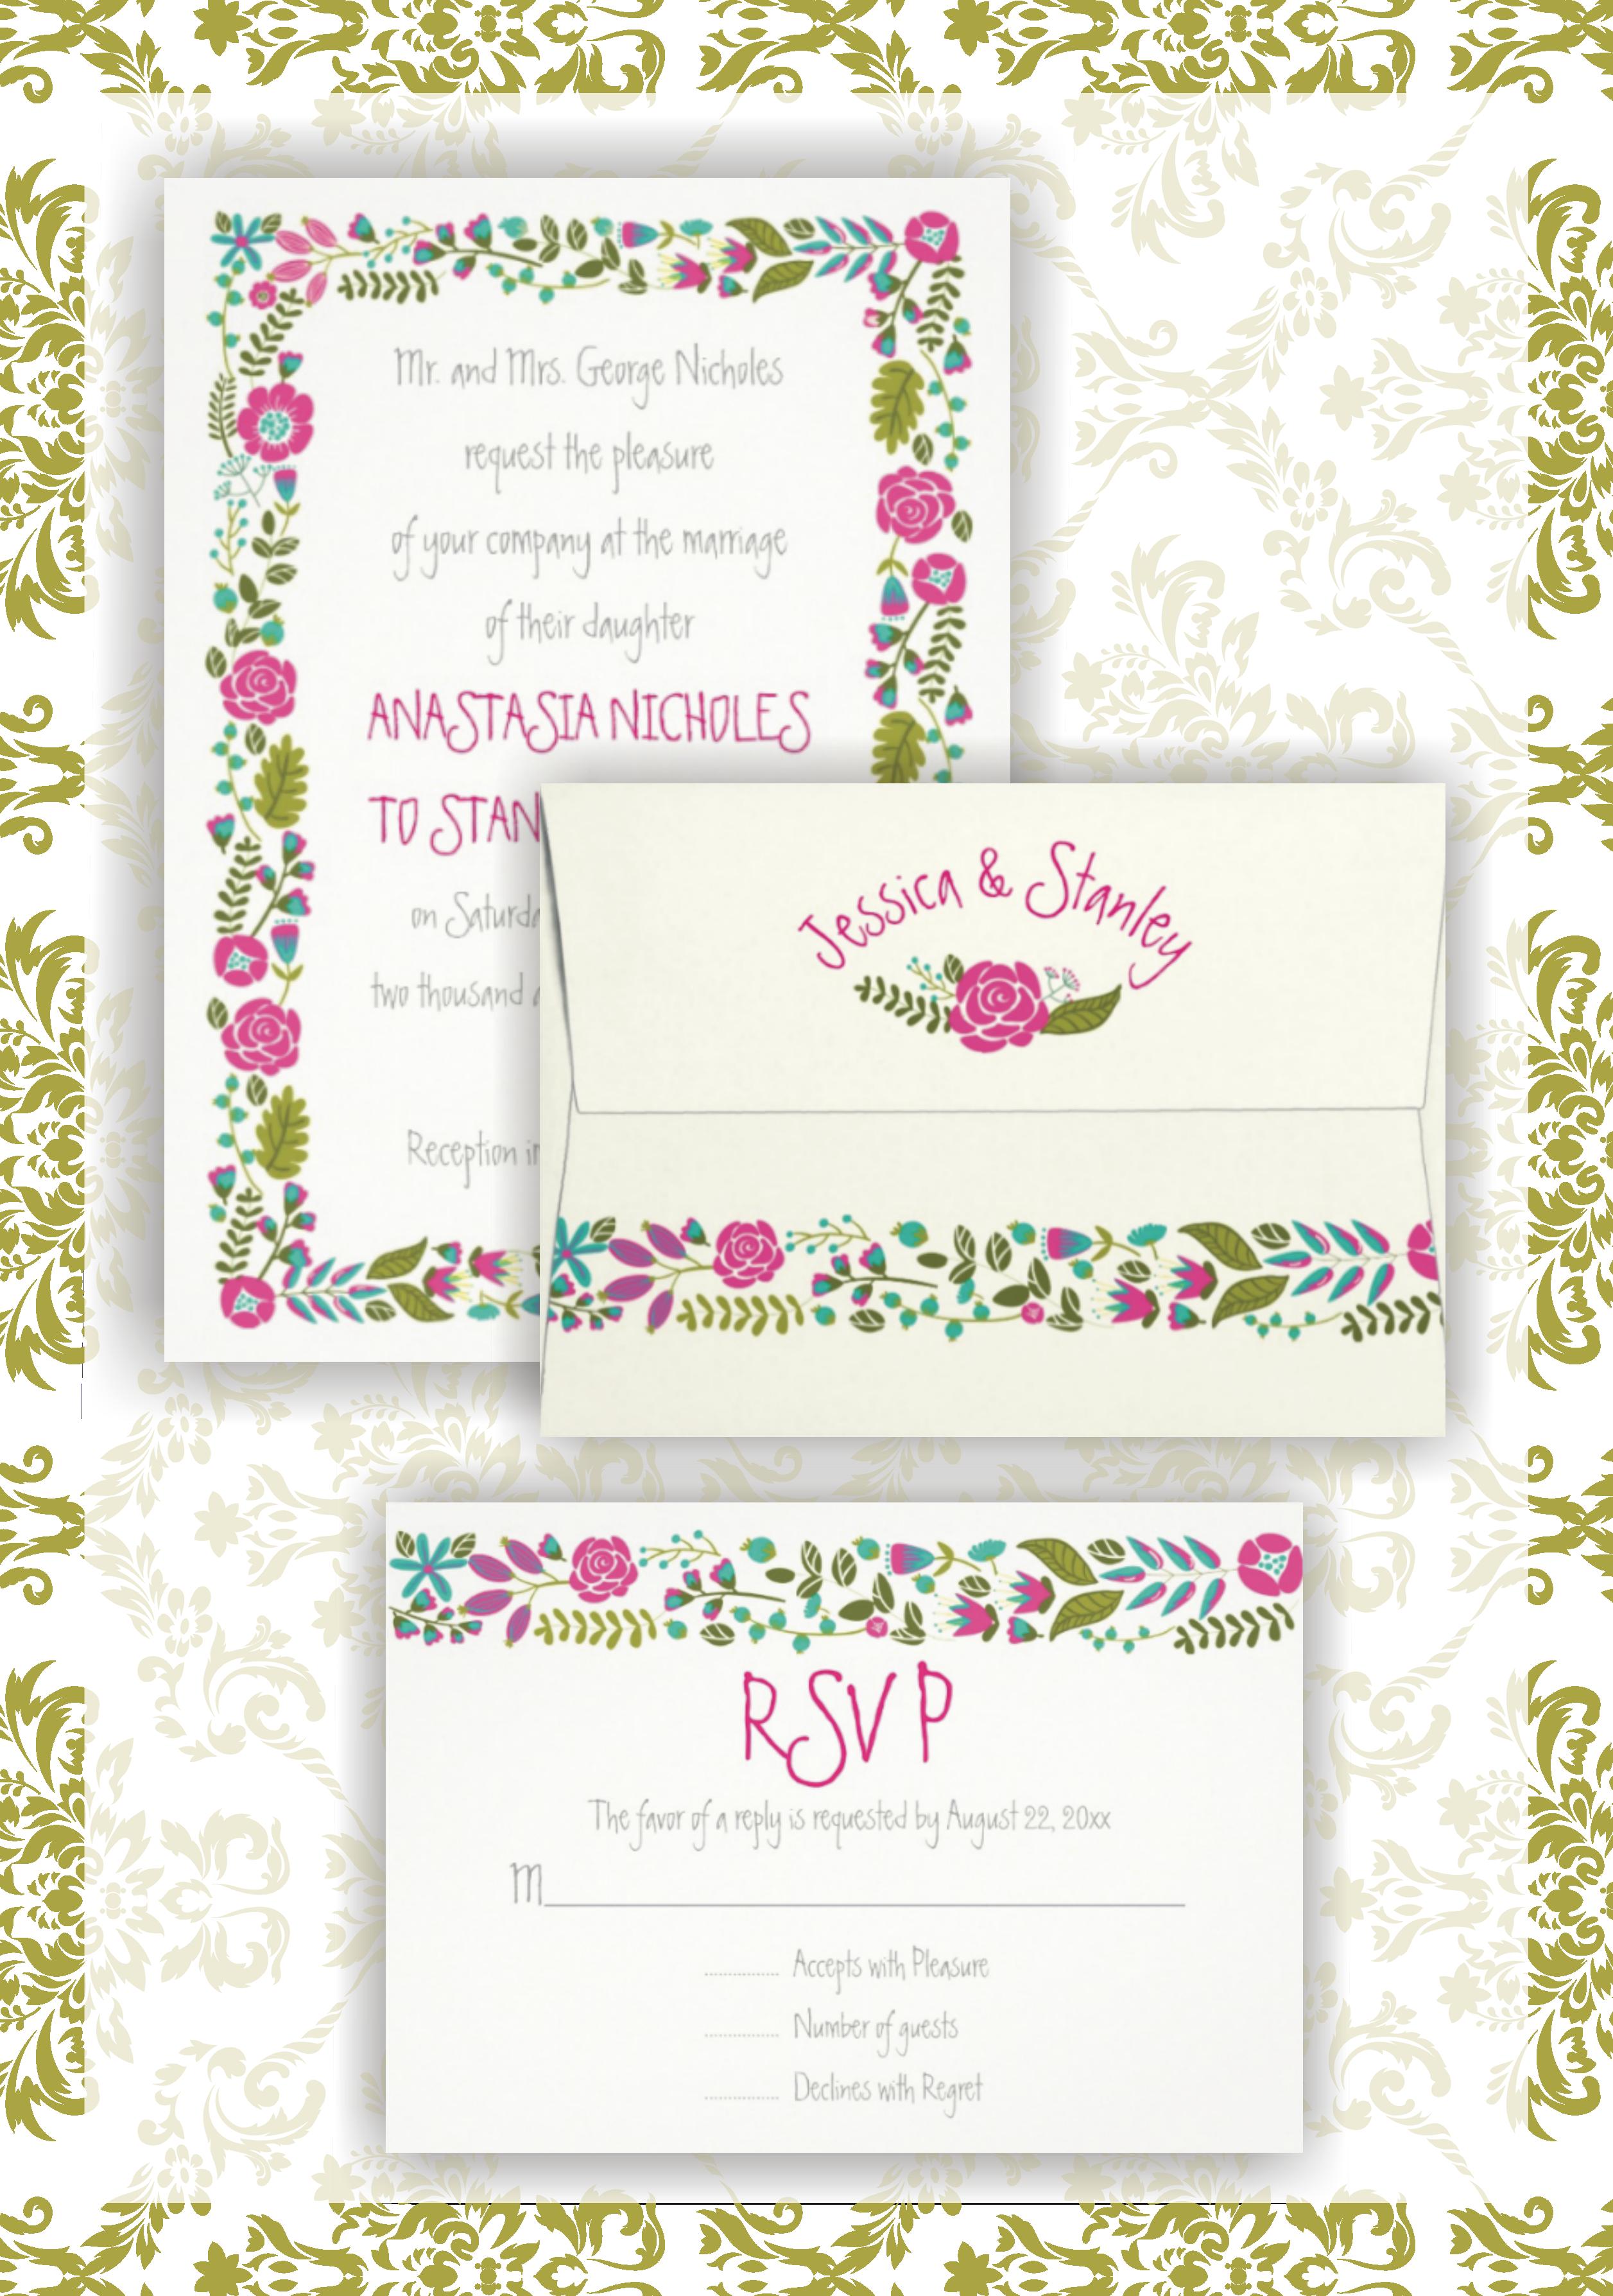 Vintage hot pink, aqua blue, teal floral border wedding invitations ...